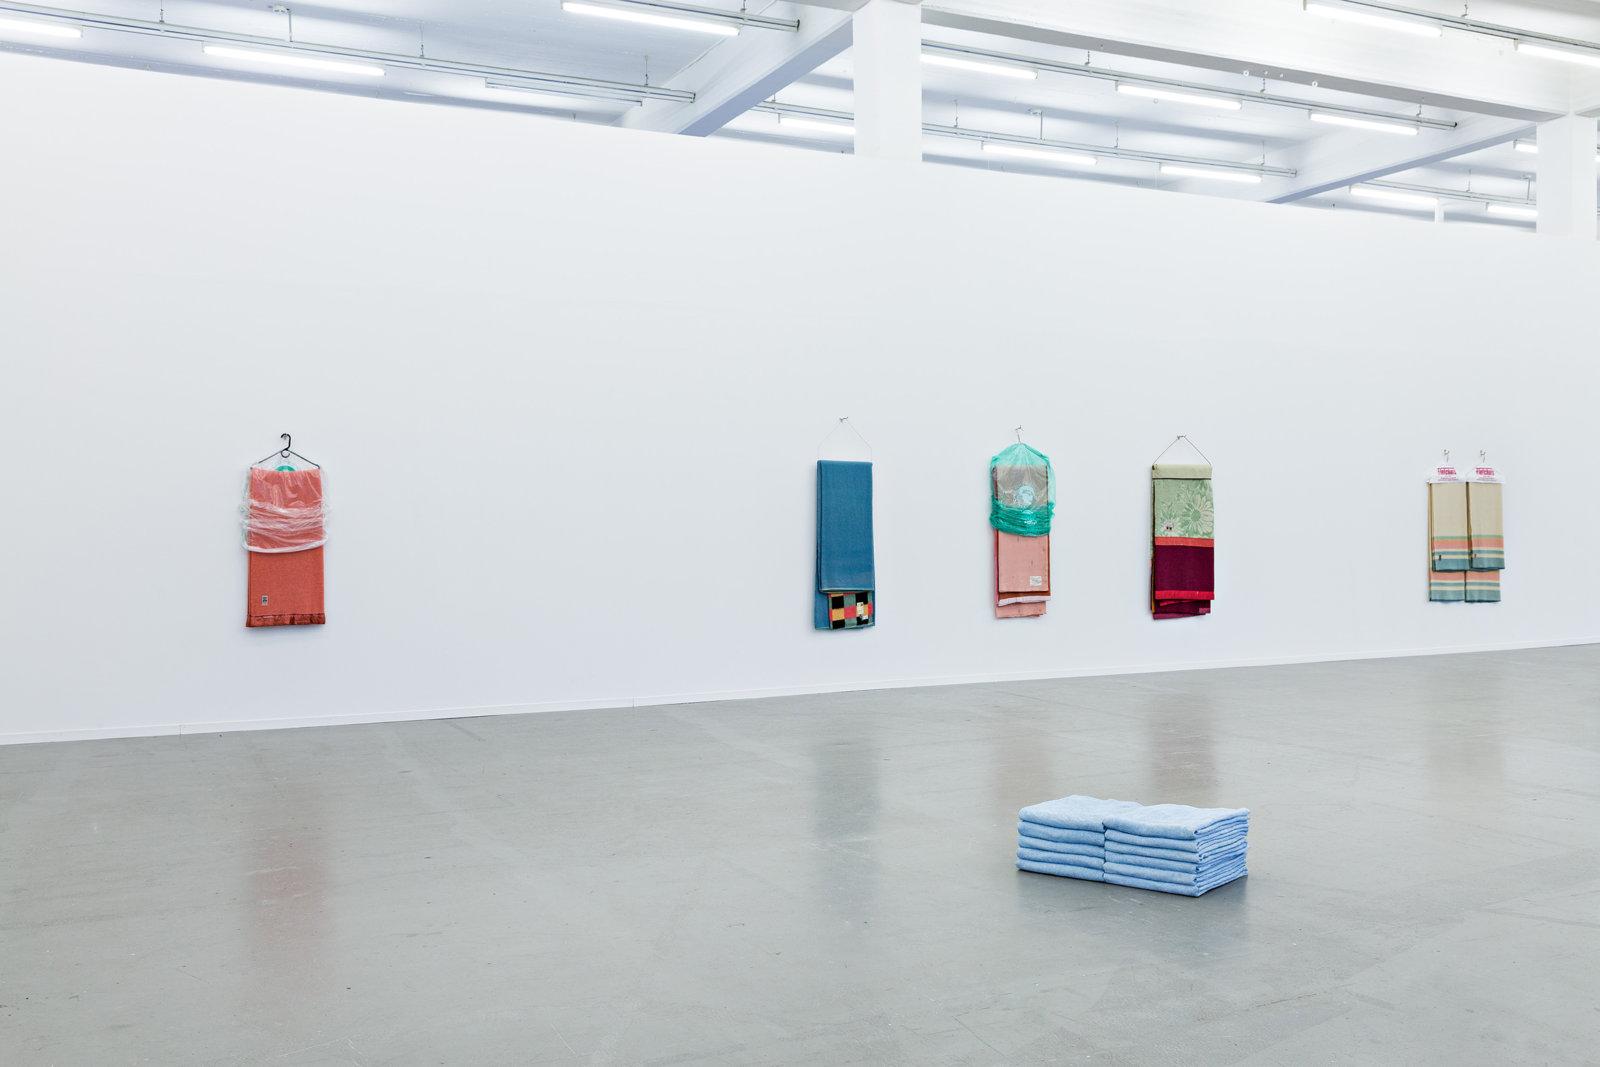 Liz Magor, installation view, you you you, Kunstverein in Hamburg, 2017 by Liz Magor